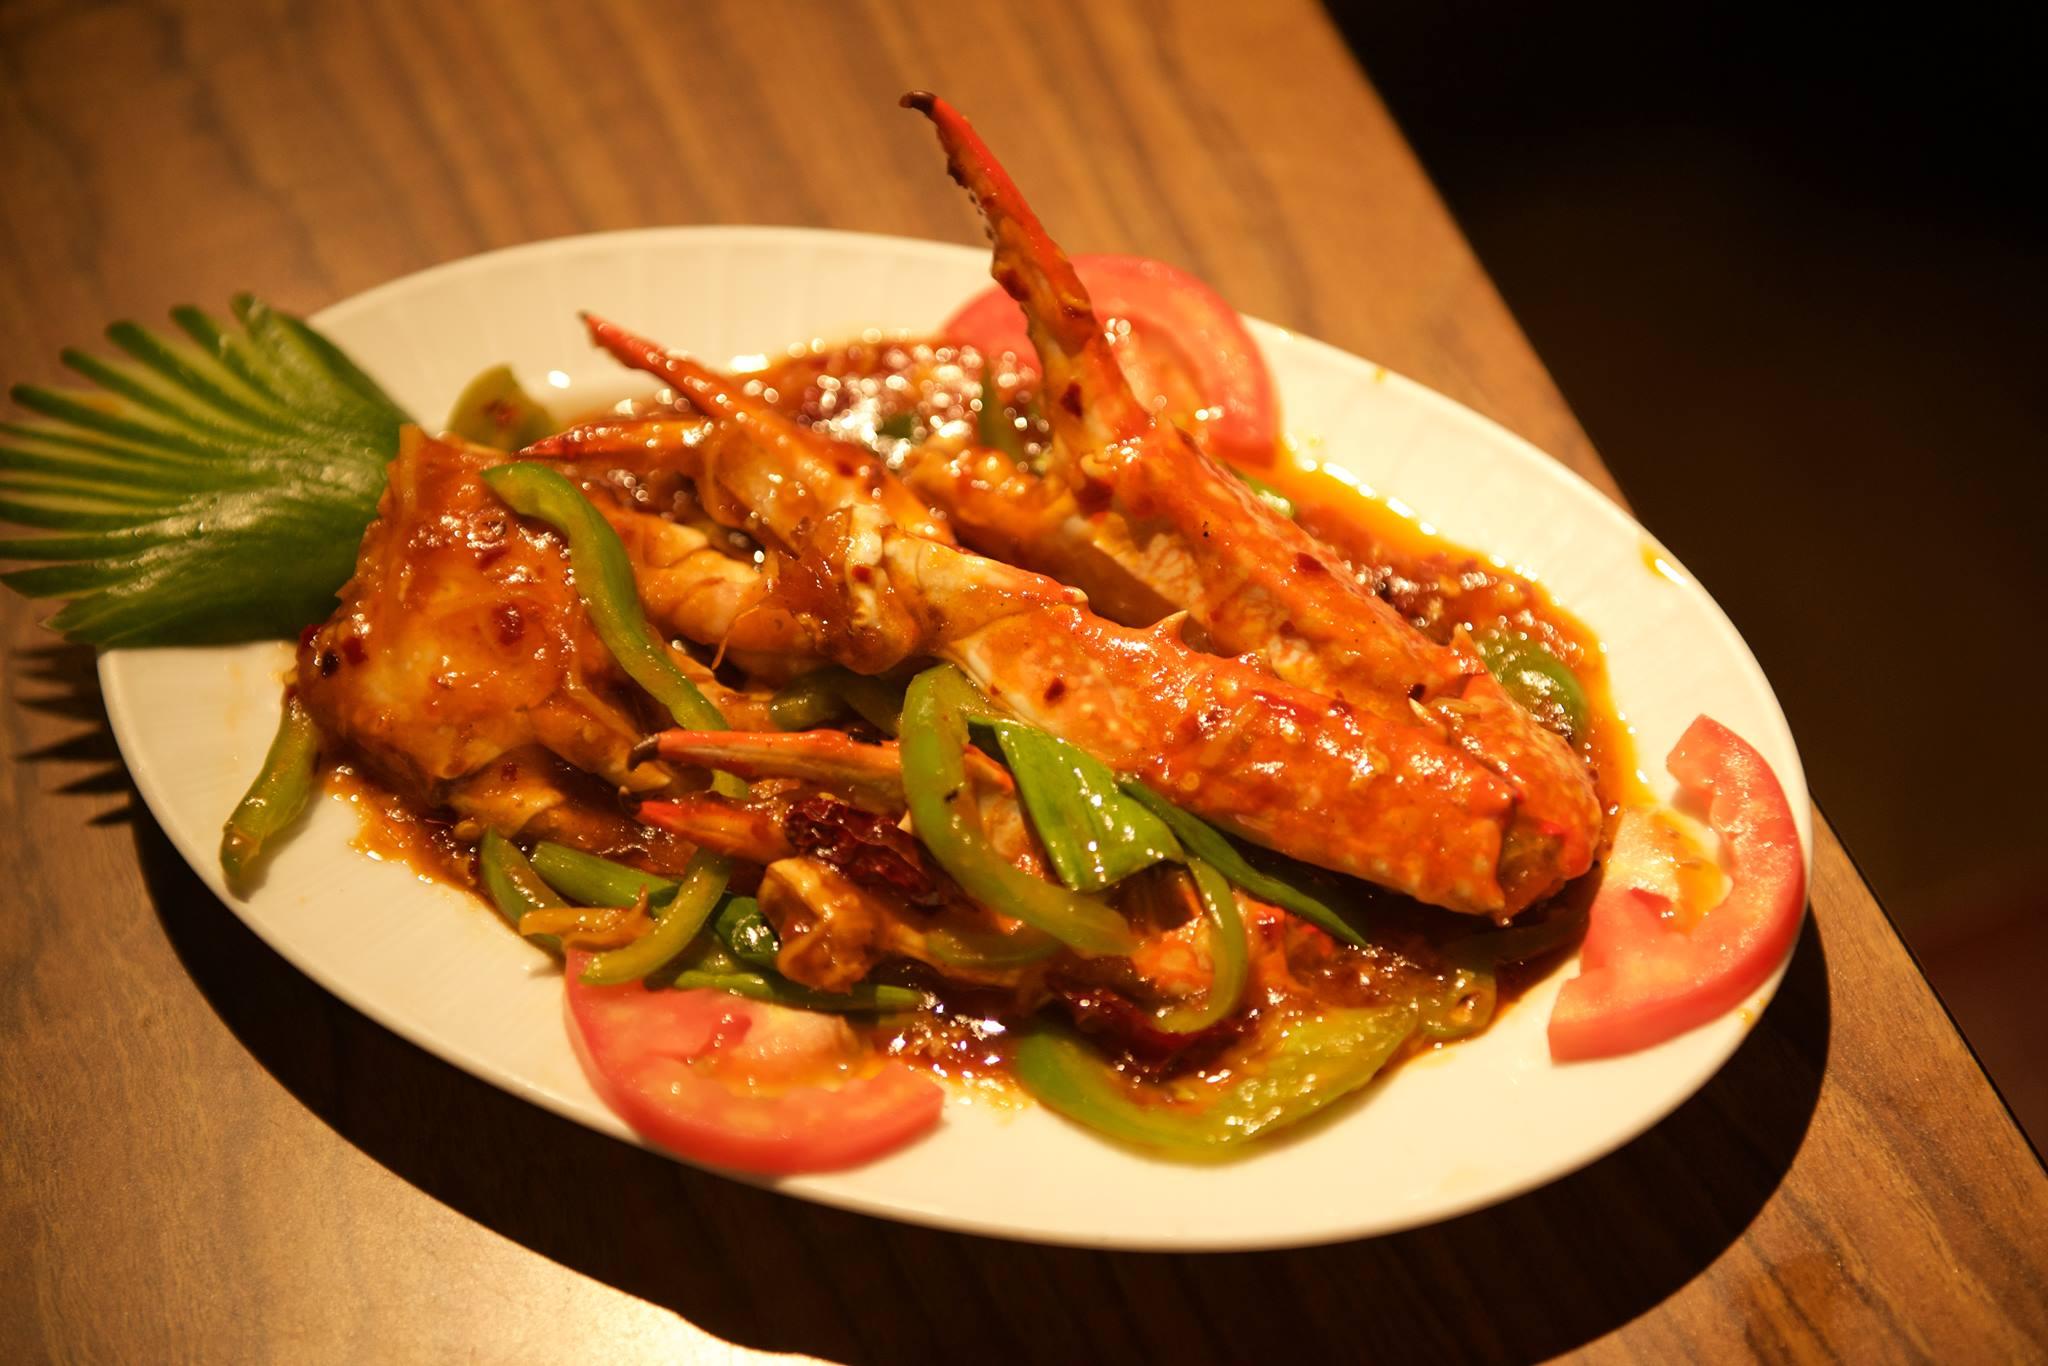 شيف لانكا دبي Chef Lanka Dubai